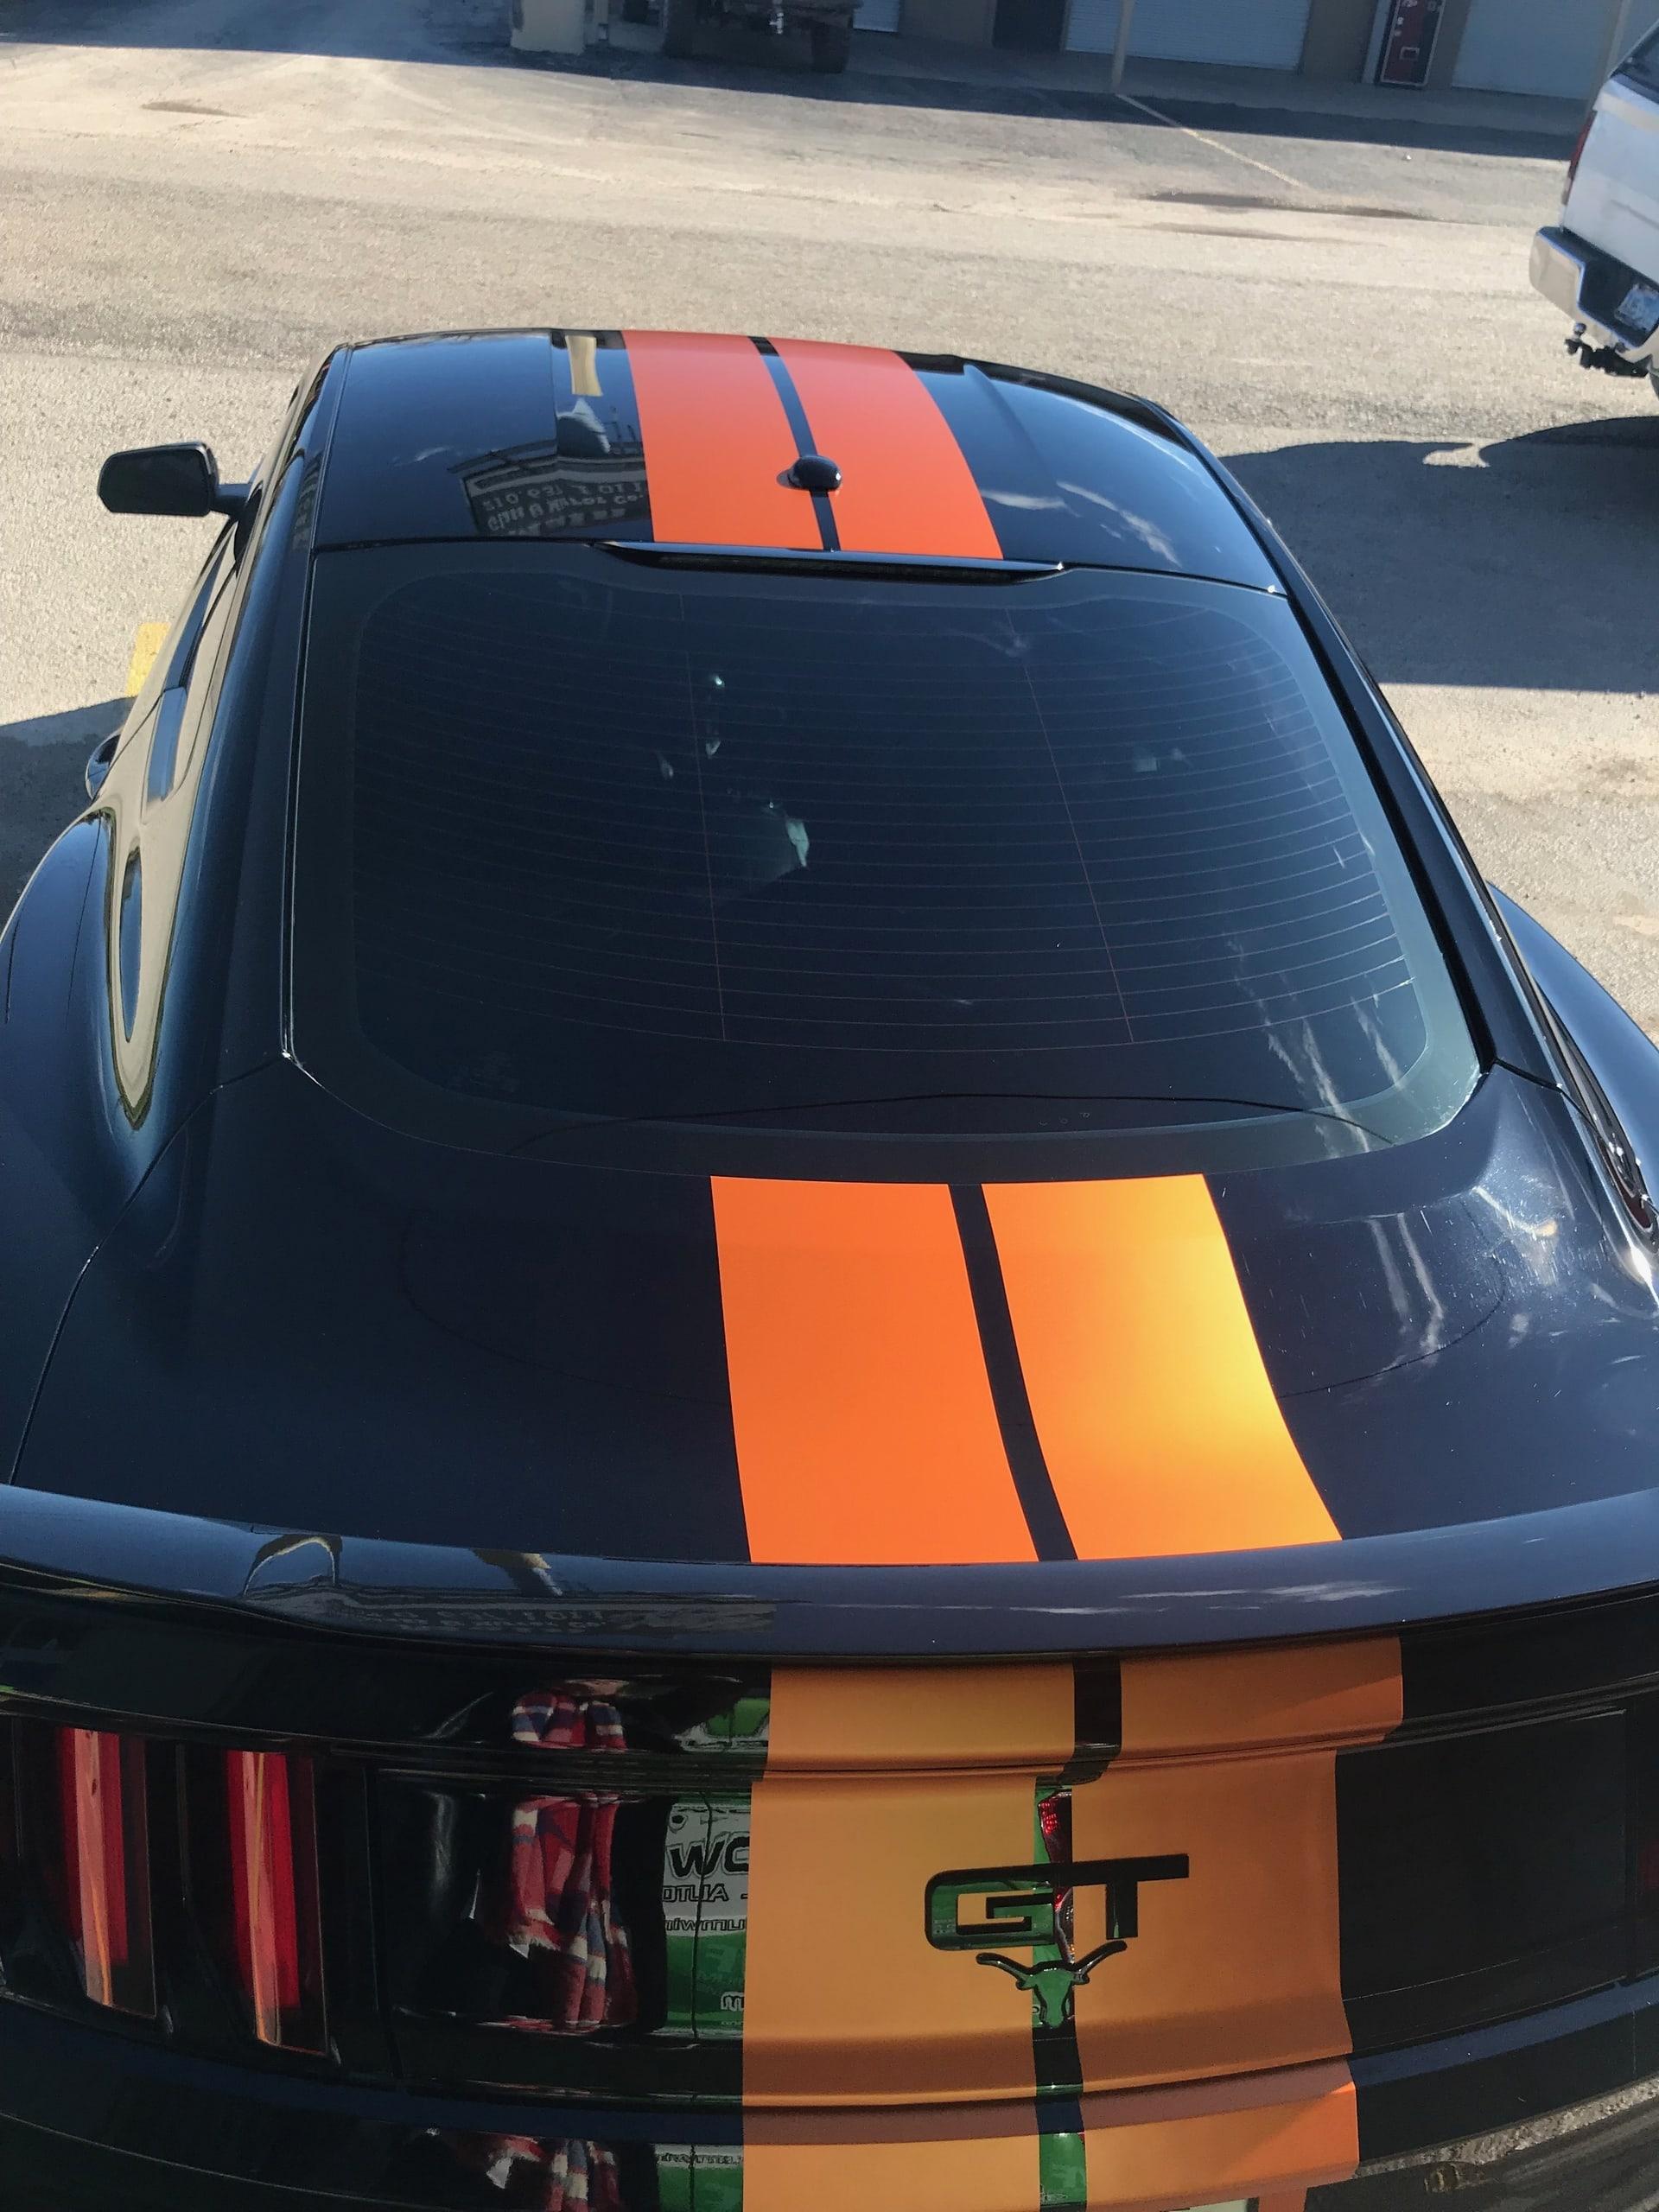 Longhorn Orange race stripes added to black Mustang GT